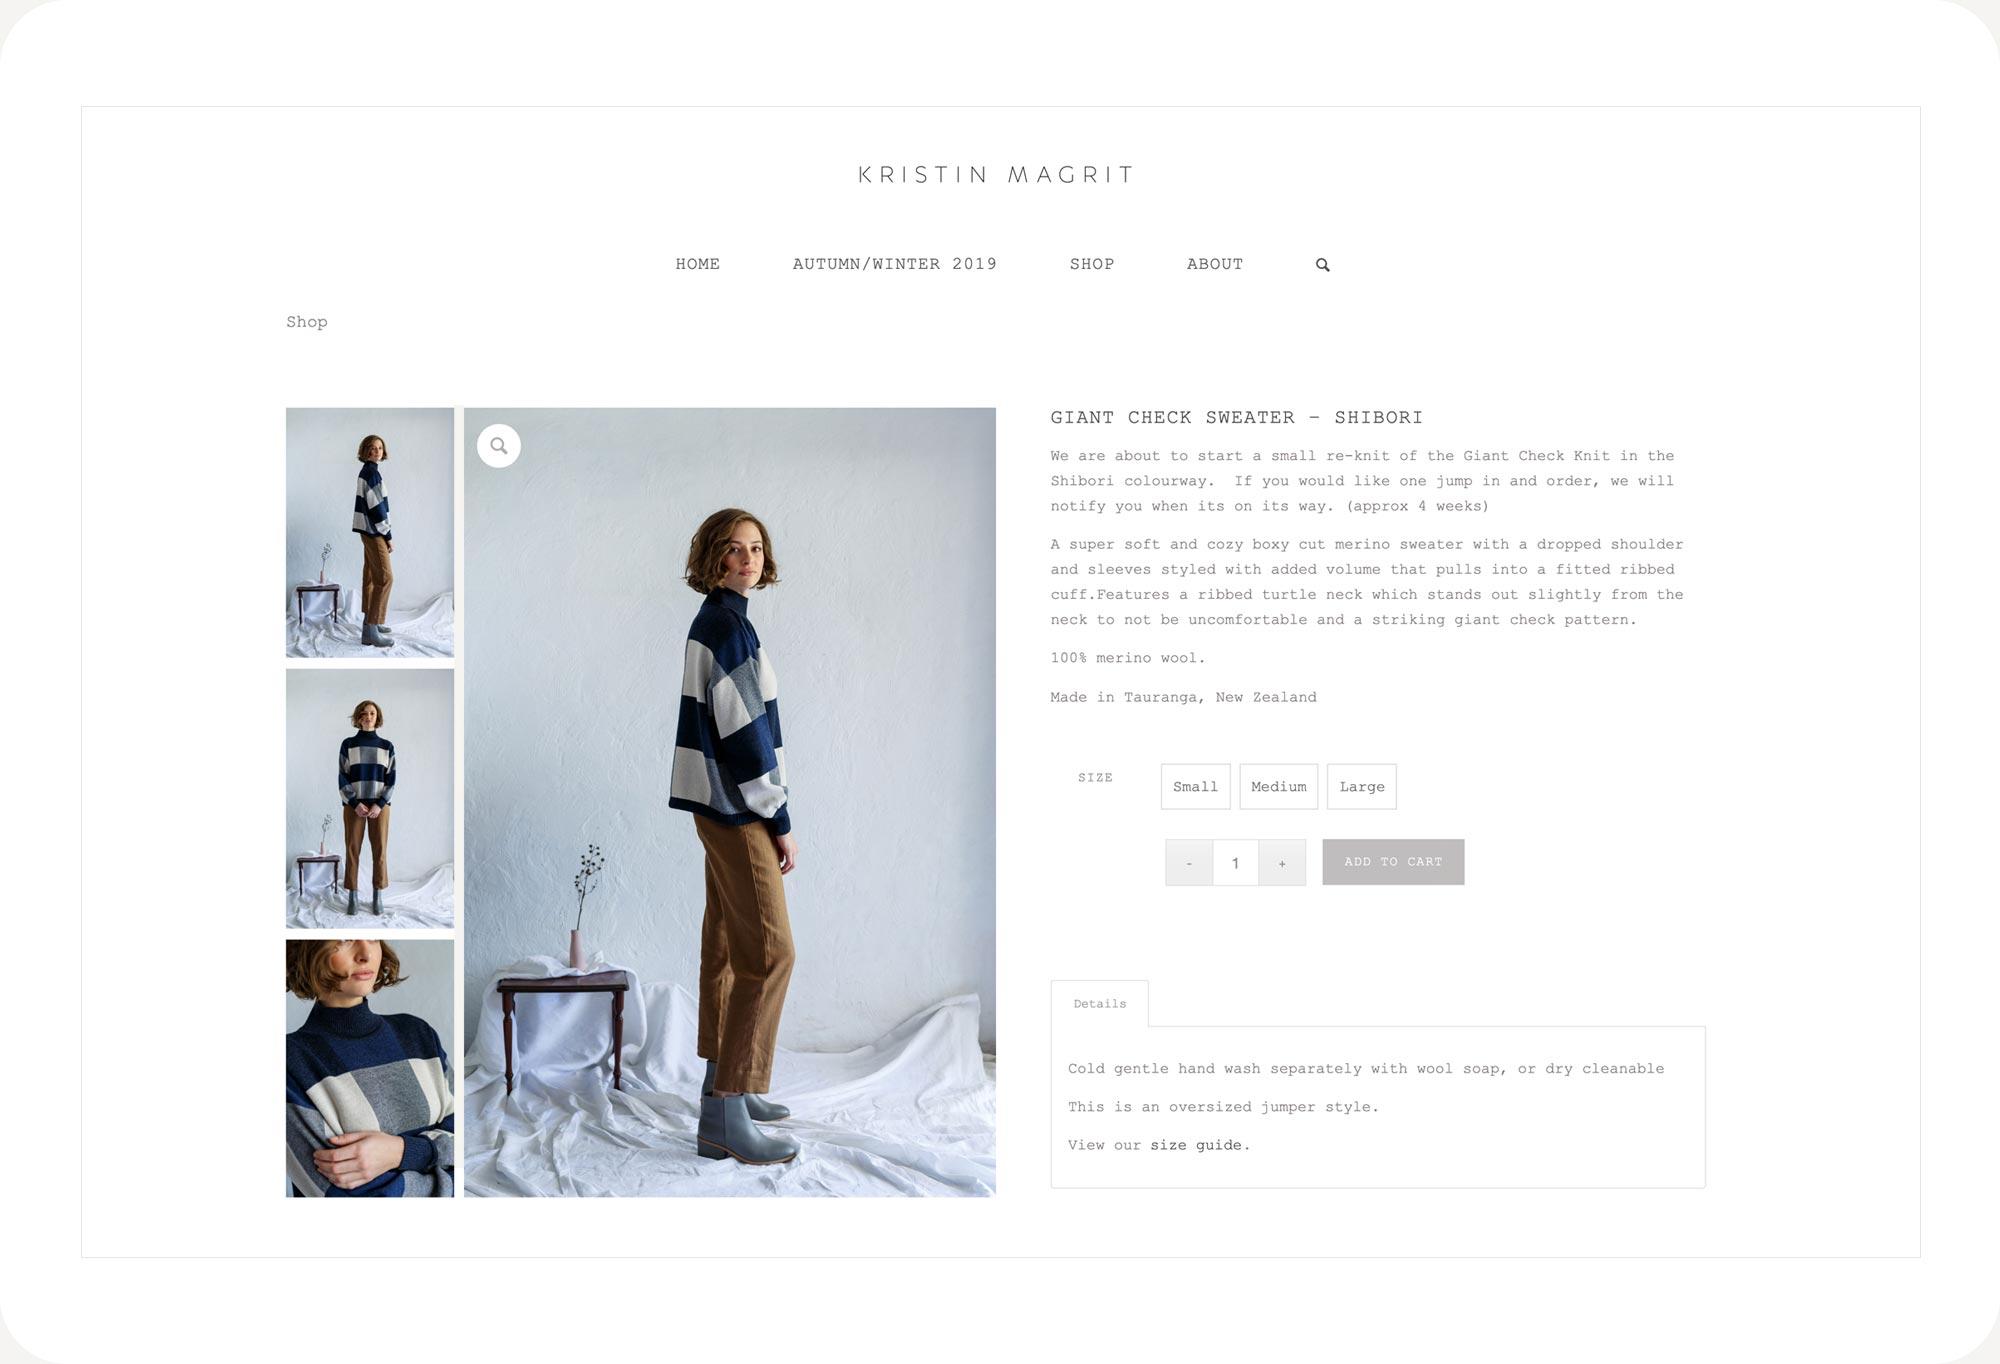 Kristin Magrit's website